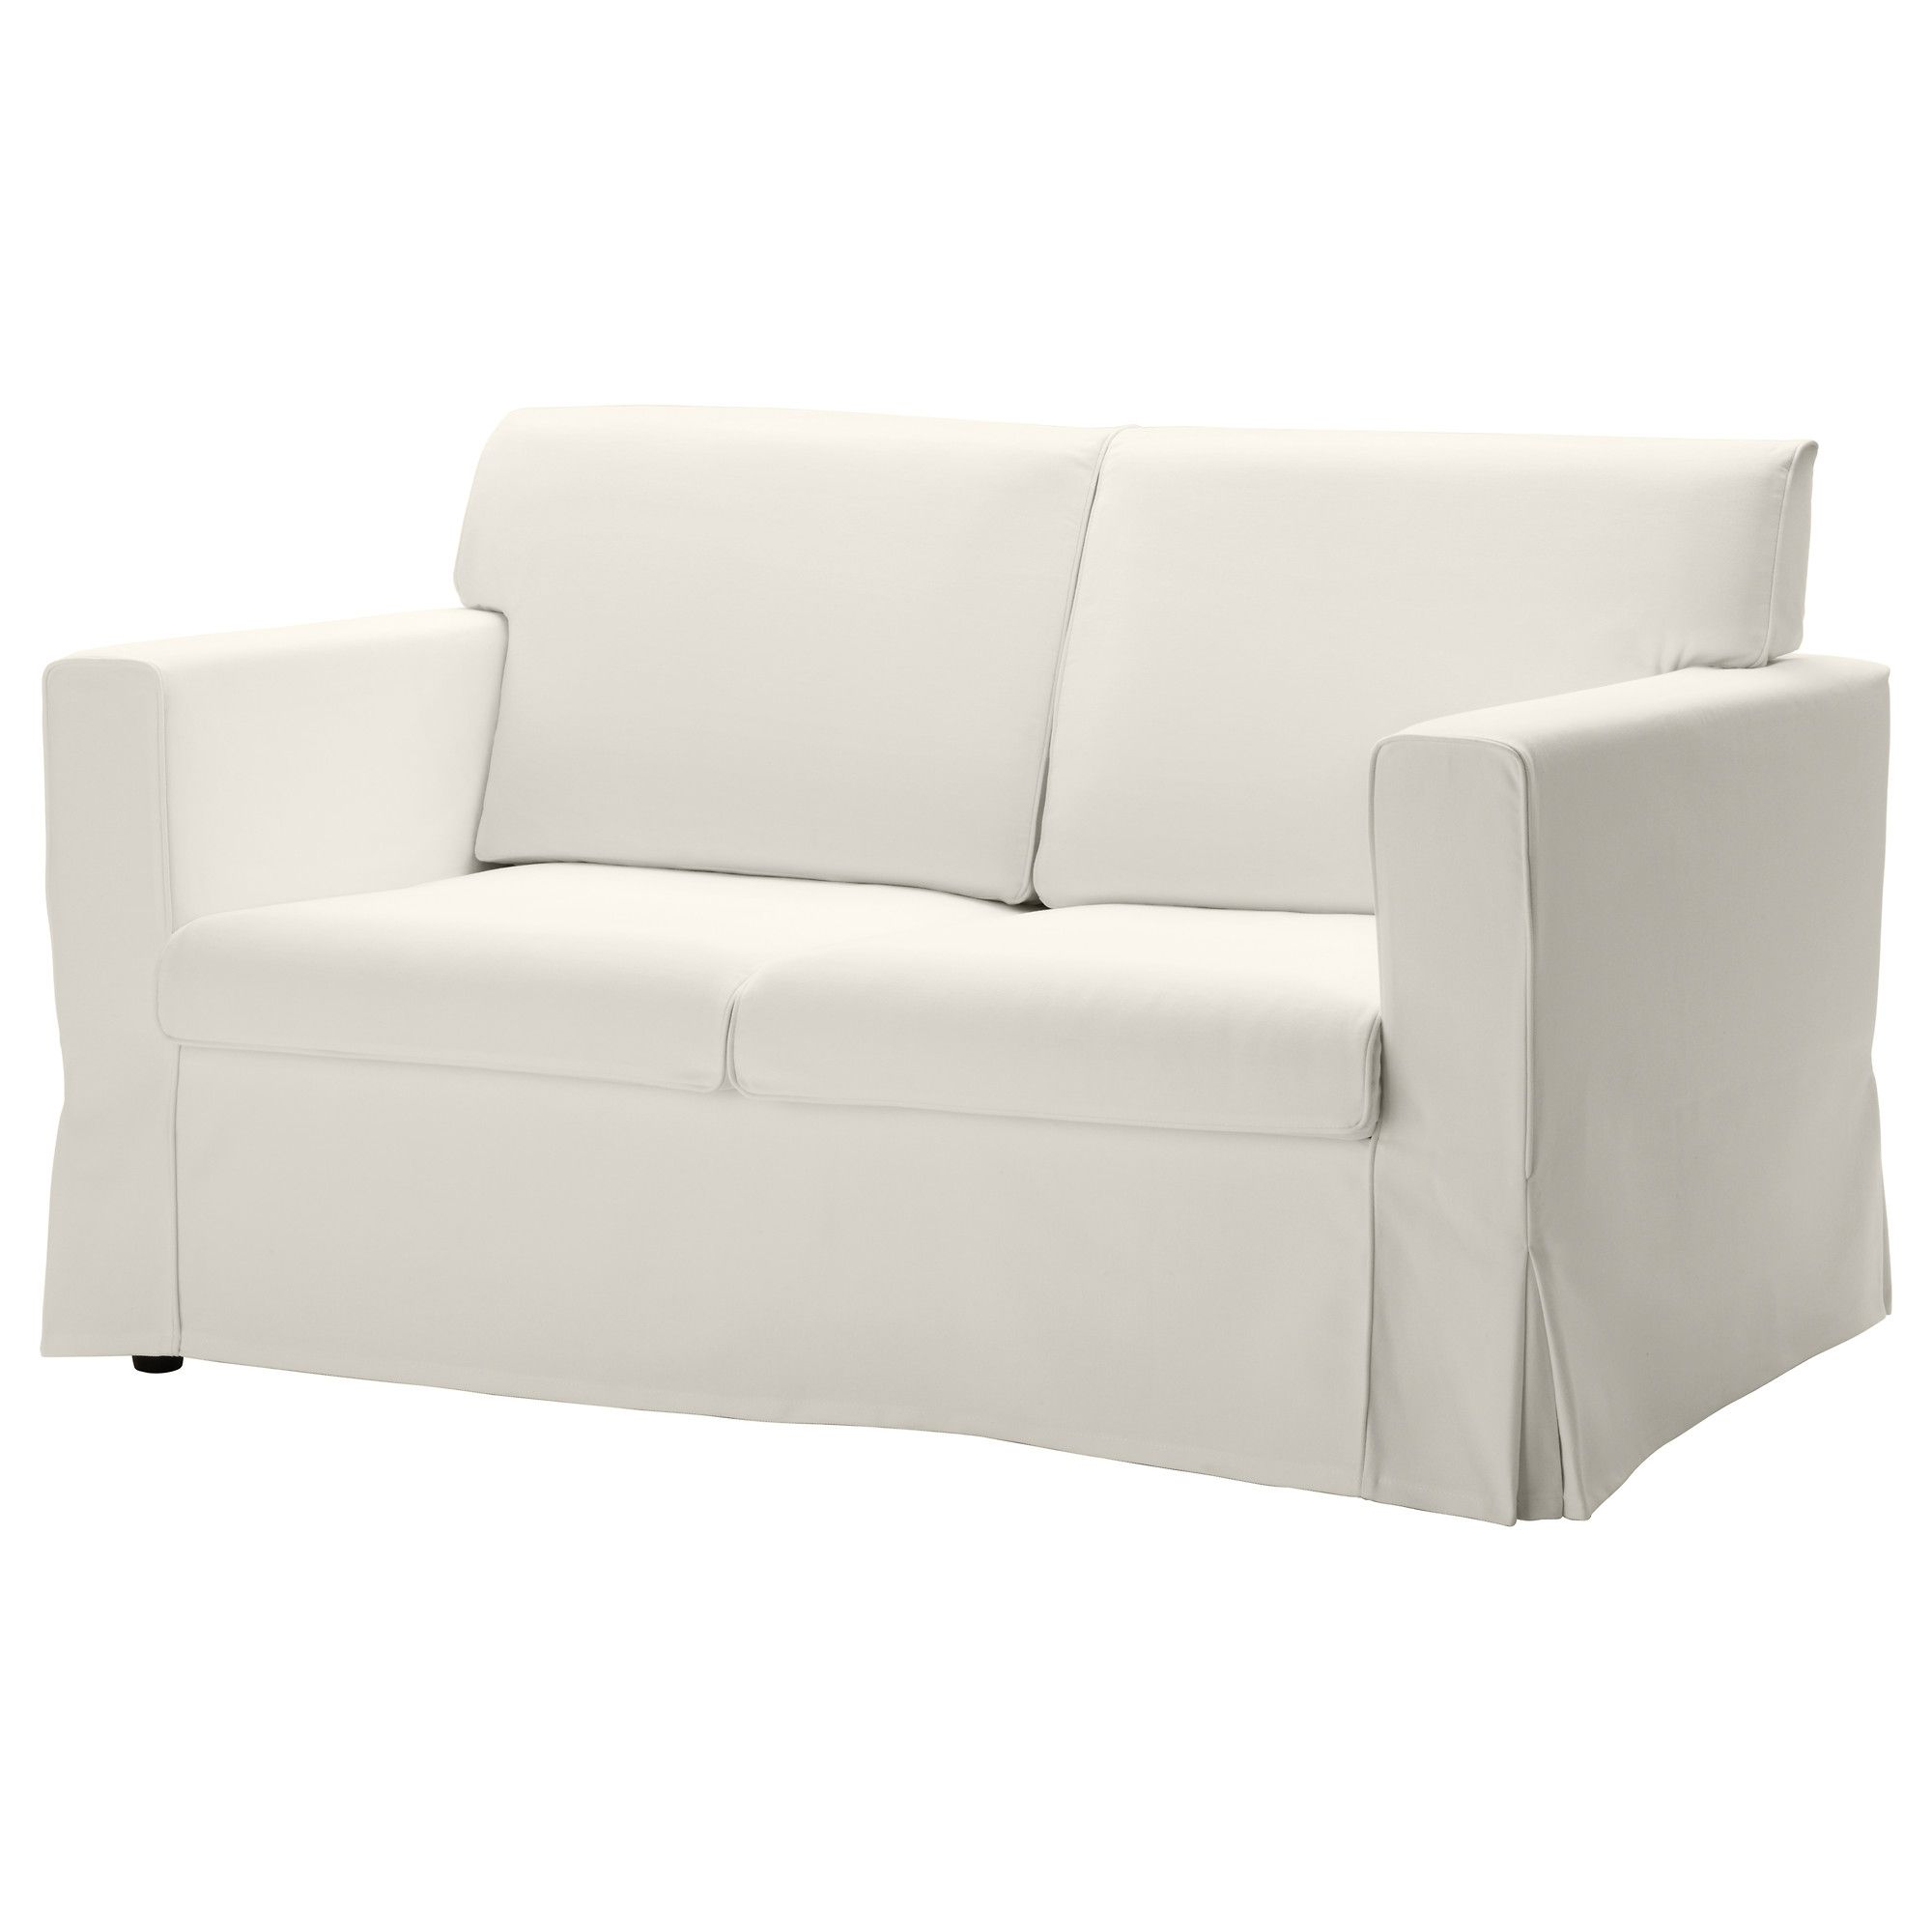 2er sofa ikea  SANDBY 2er-Sofa - Blekinge weiß - IKEA €219 | wohnung_sofa ...